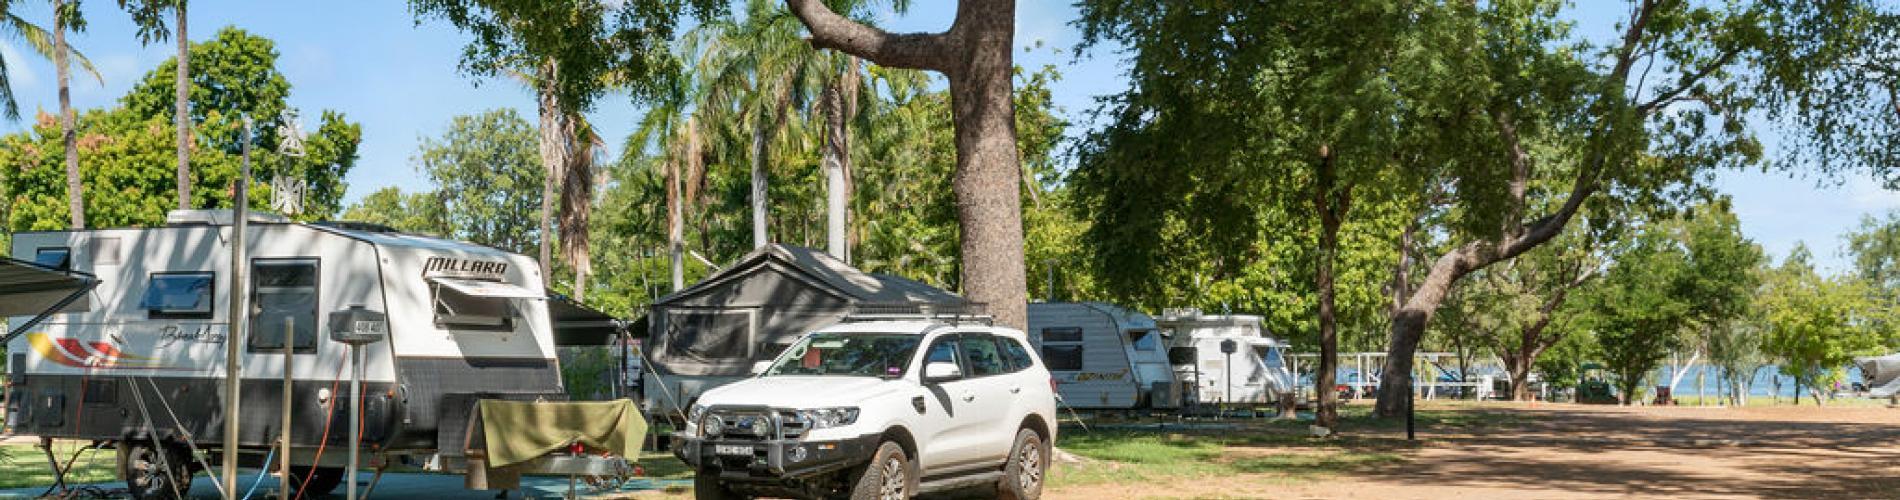 Caravan Park Kununurra Kimberleyland Waterfront Holiday Park